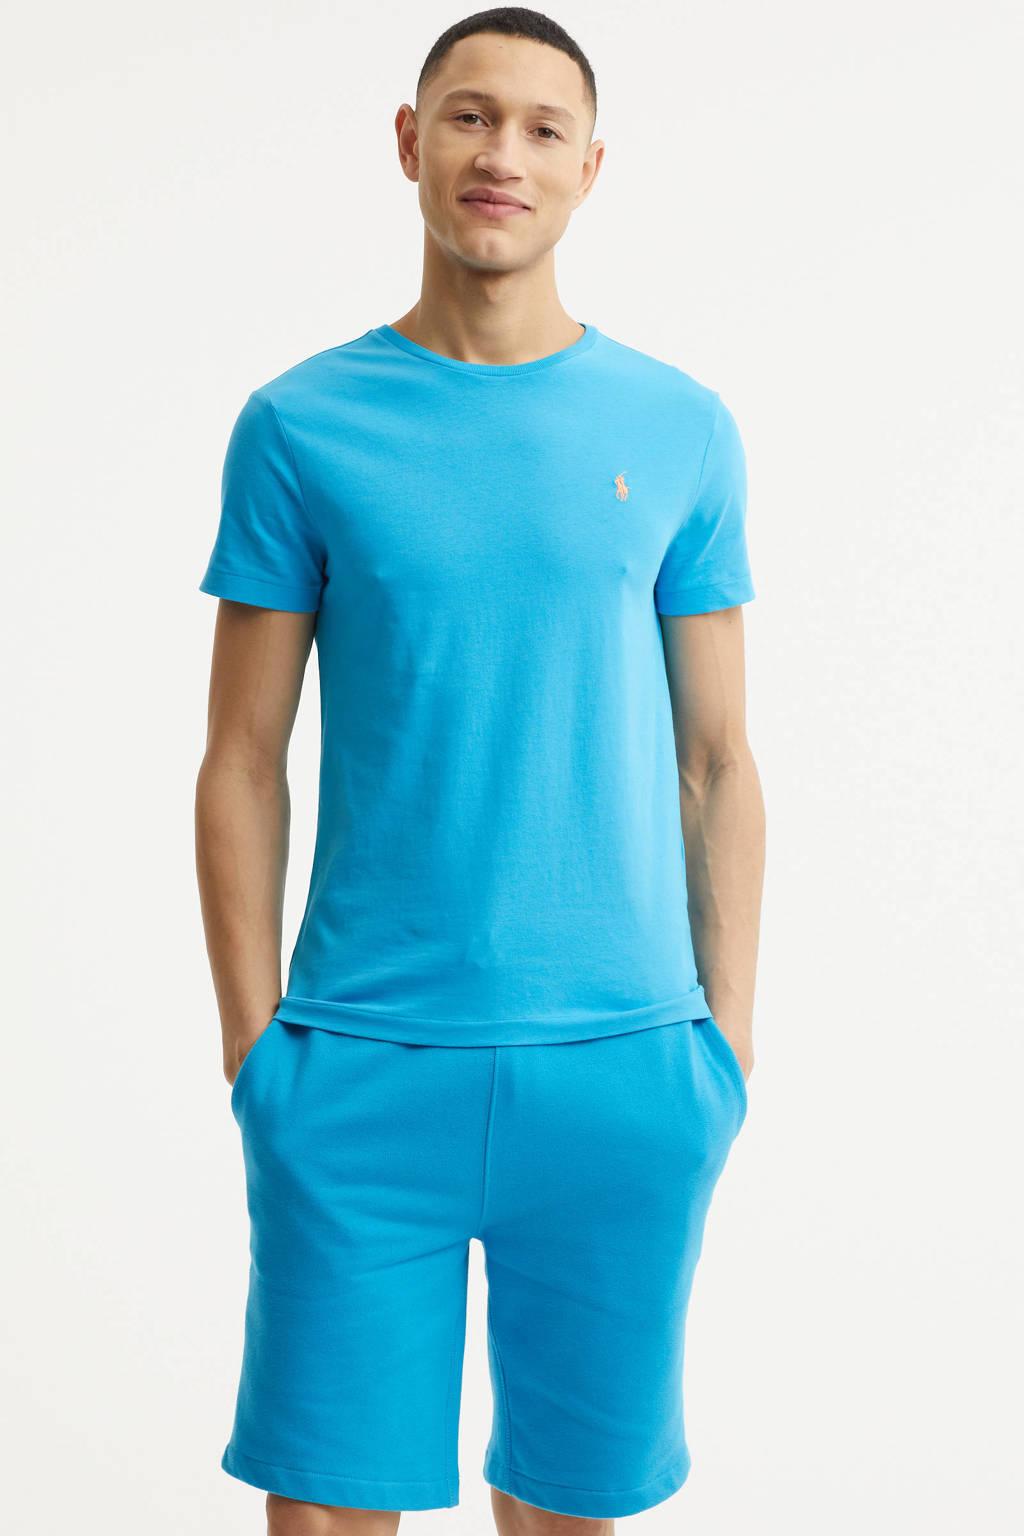 POLO Ralph Lauren T-shirt turquoise, Turquoise